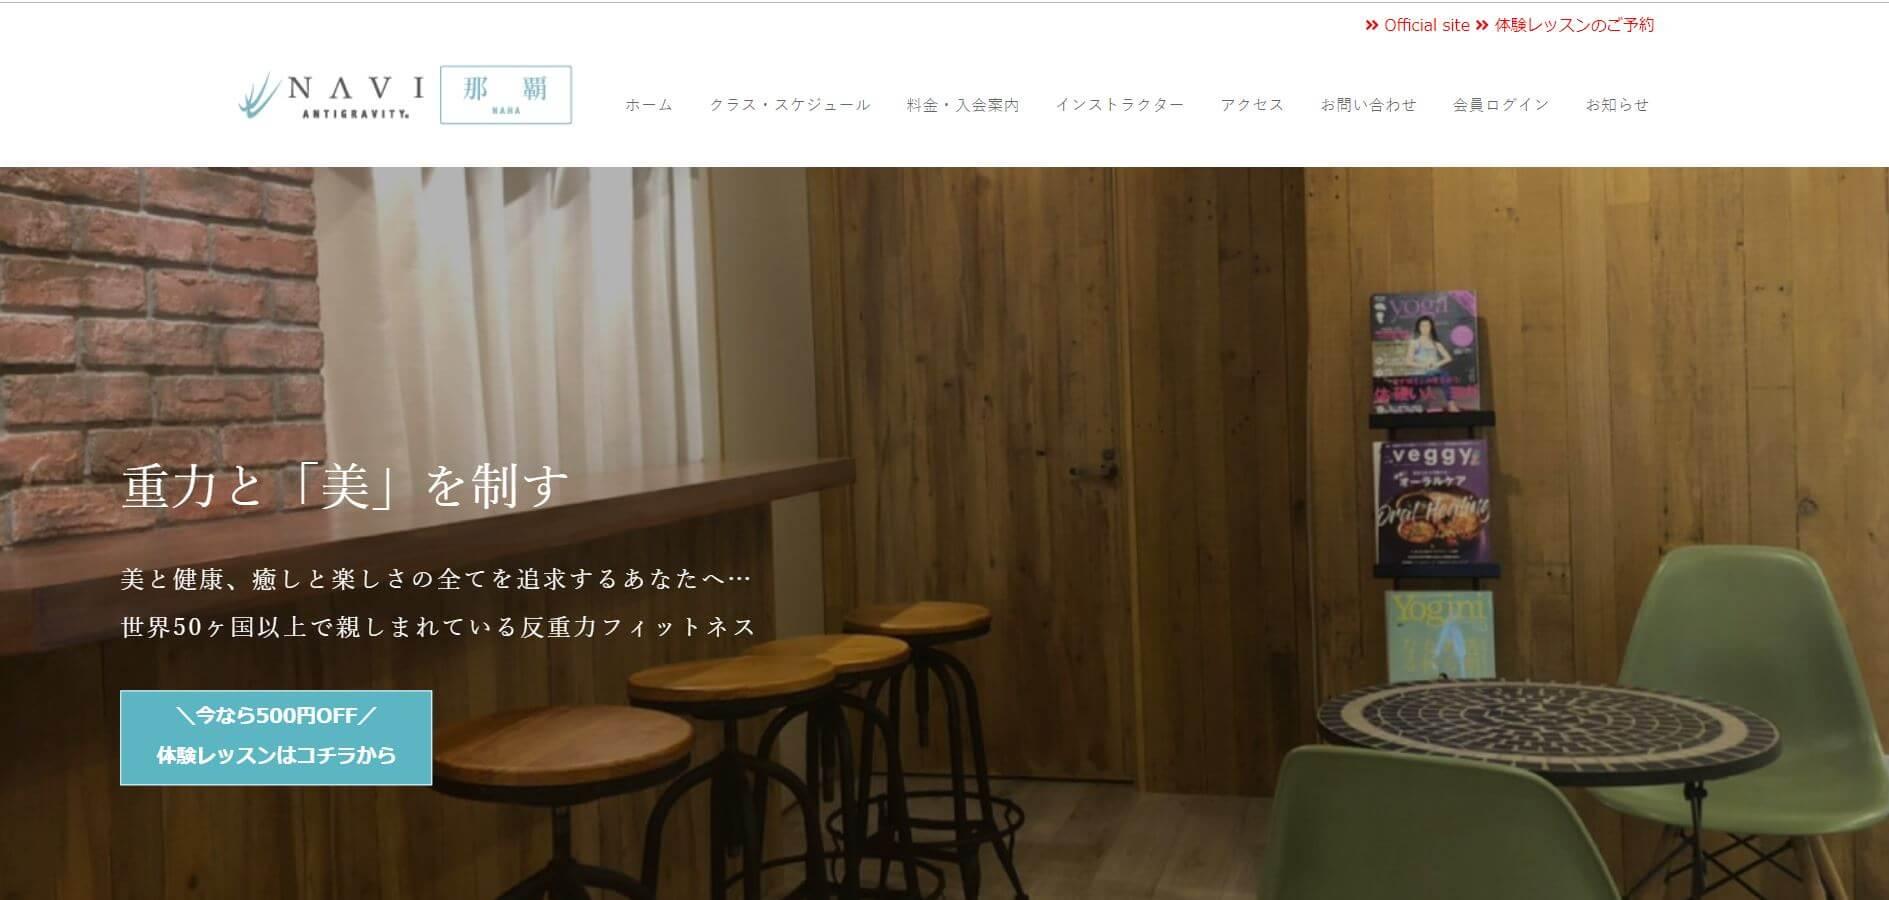 Studio NAVI 那覇&LohaSis